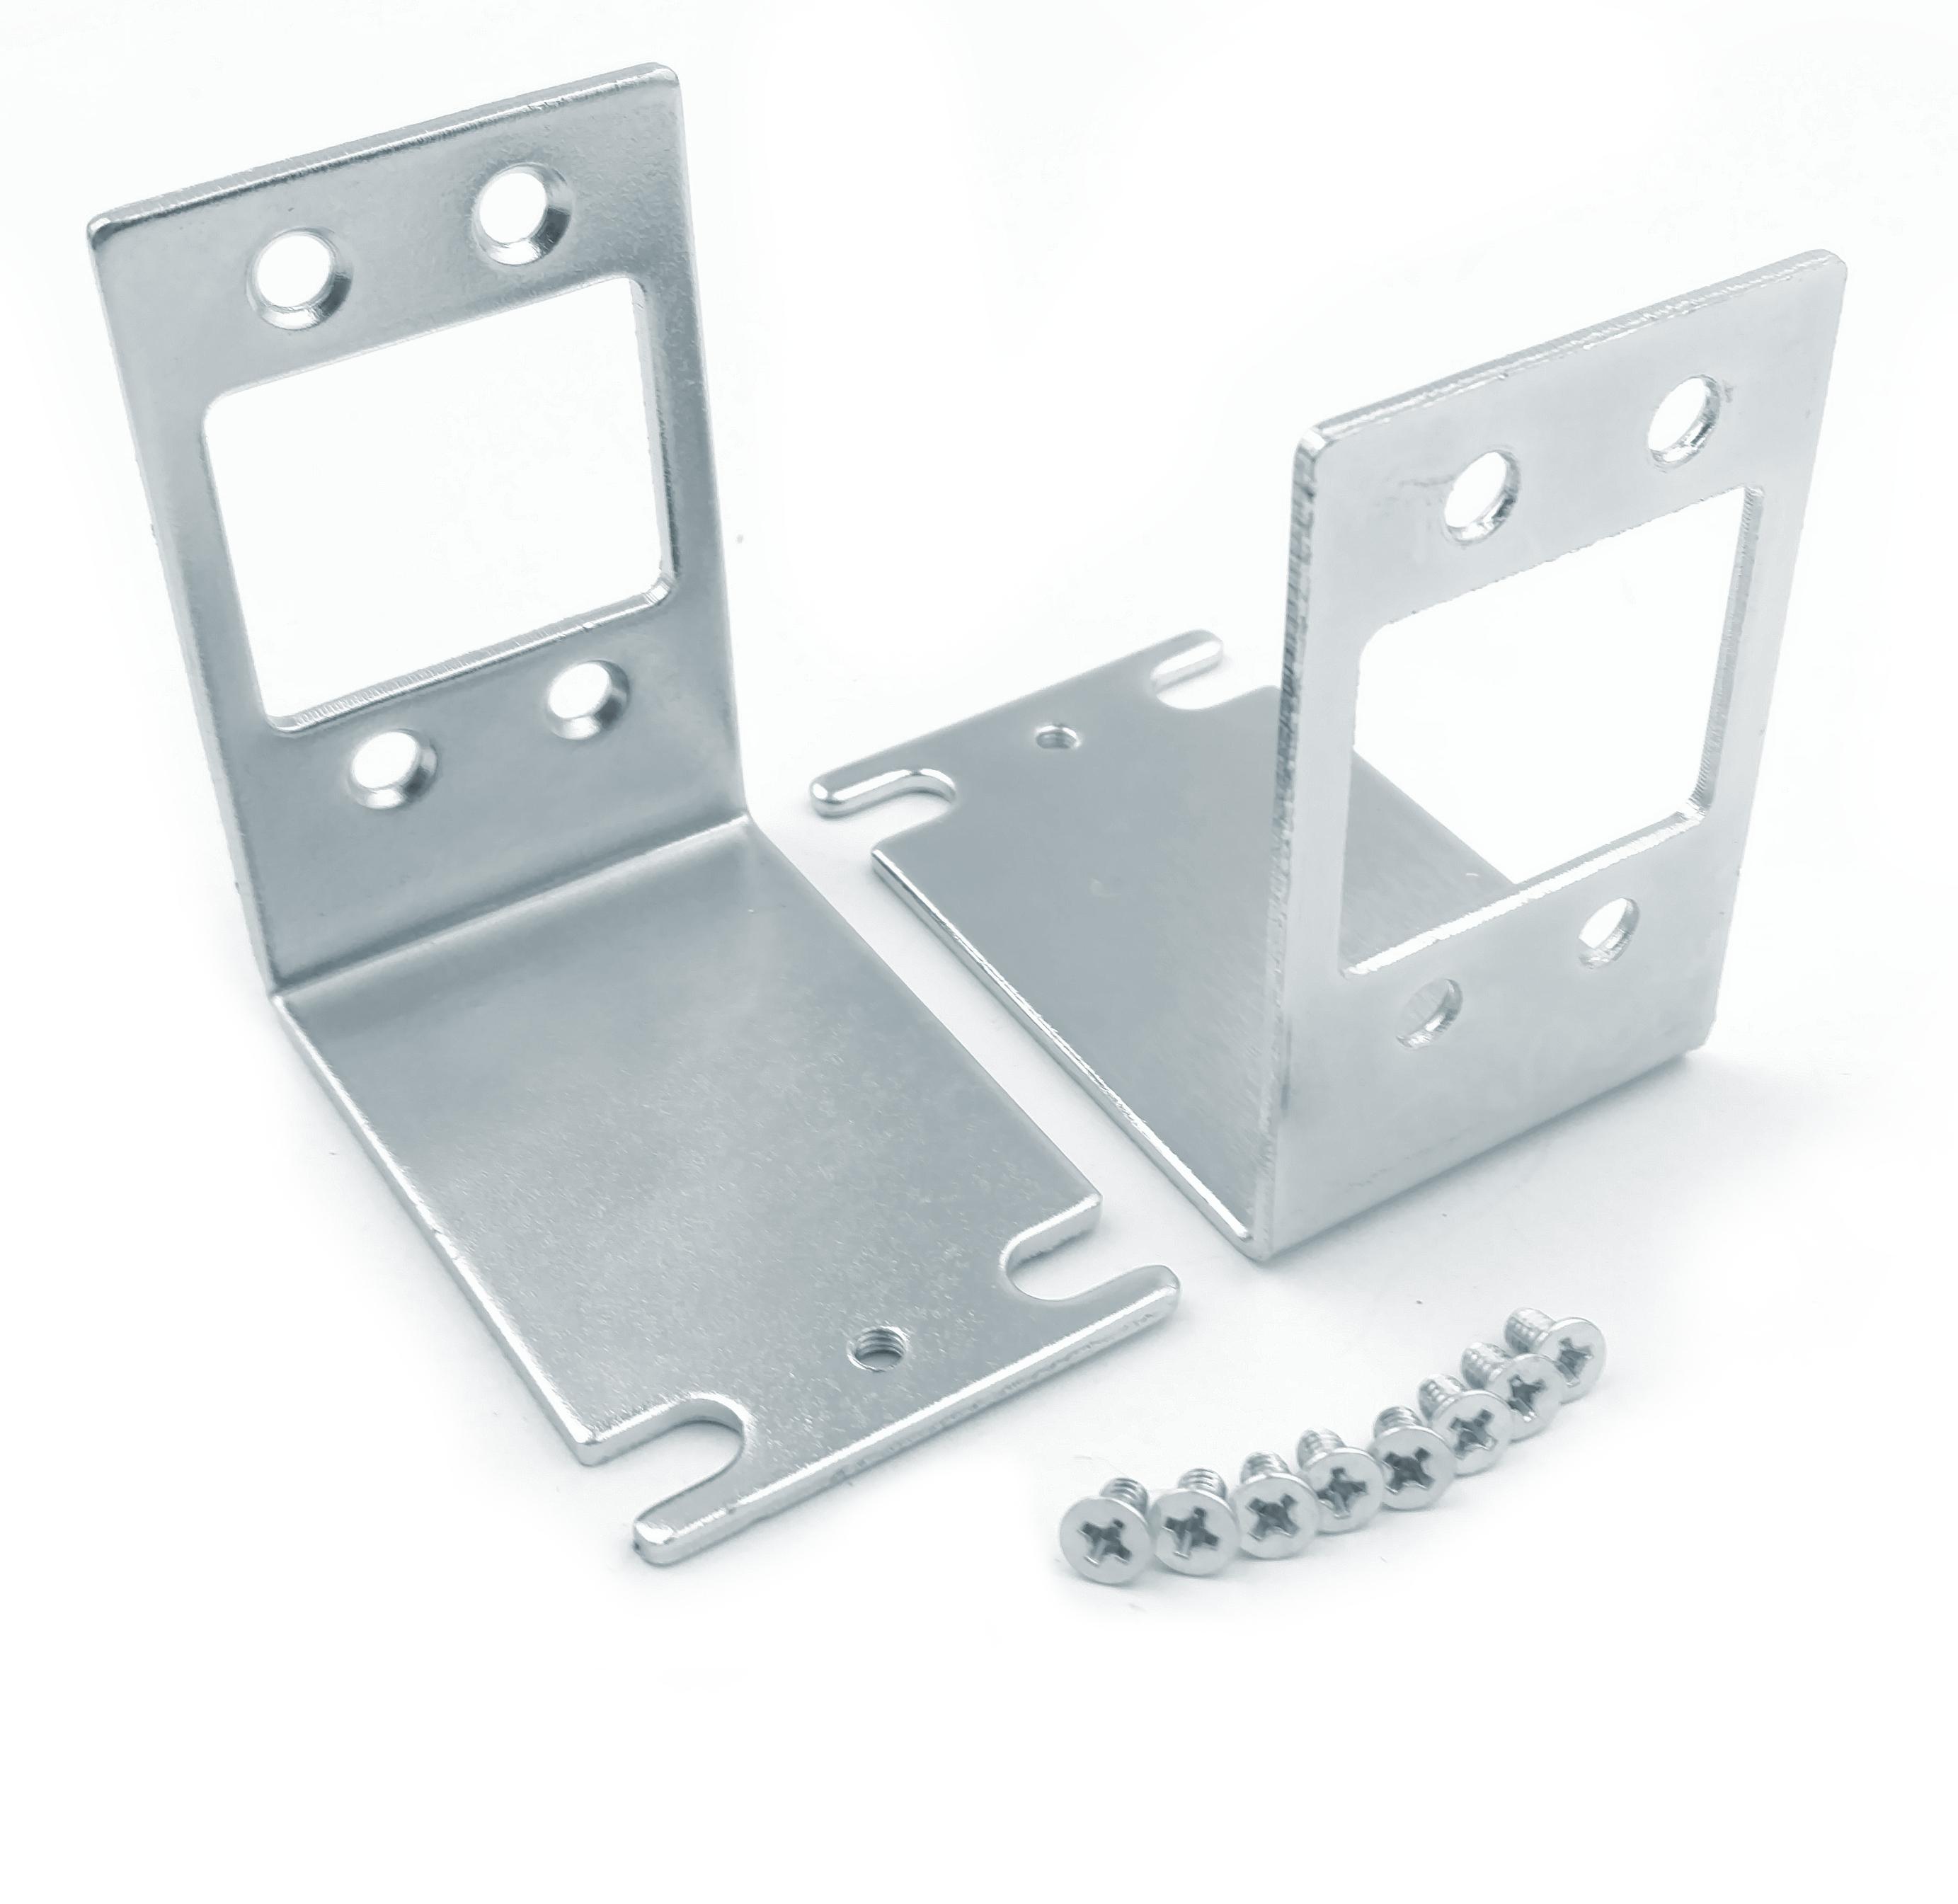 1RU Rack Mount Kit for Cisco 3560-X/3750-X, C3KX-RACK-KIT-19